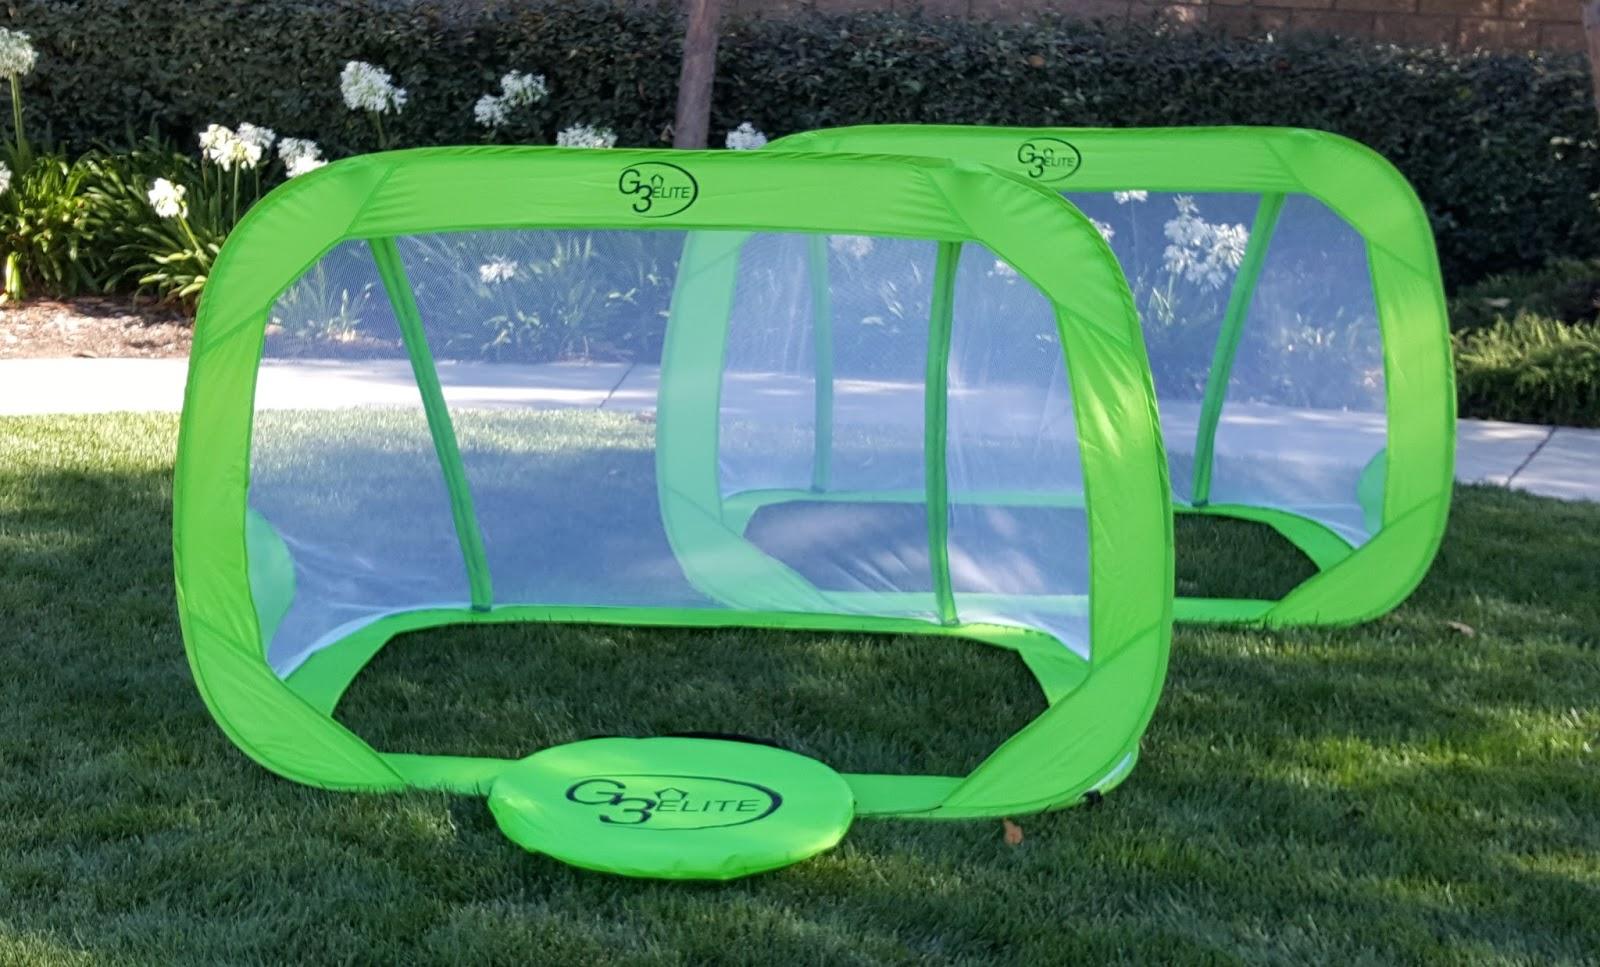 24x8 8x24 regulation size portable steel soccer goal g3elite